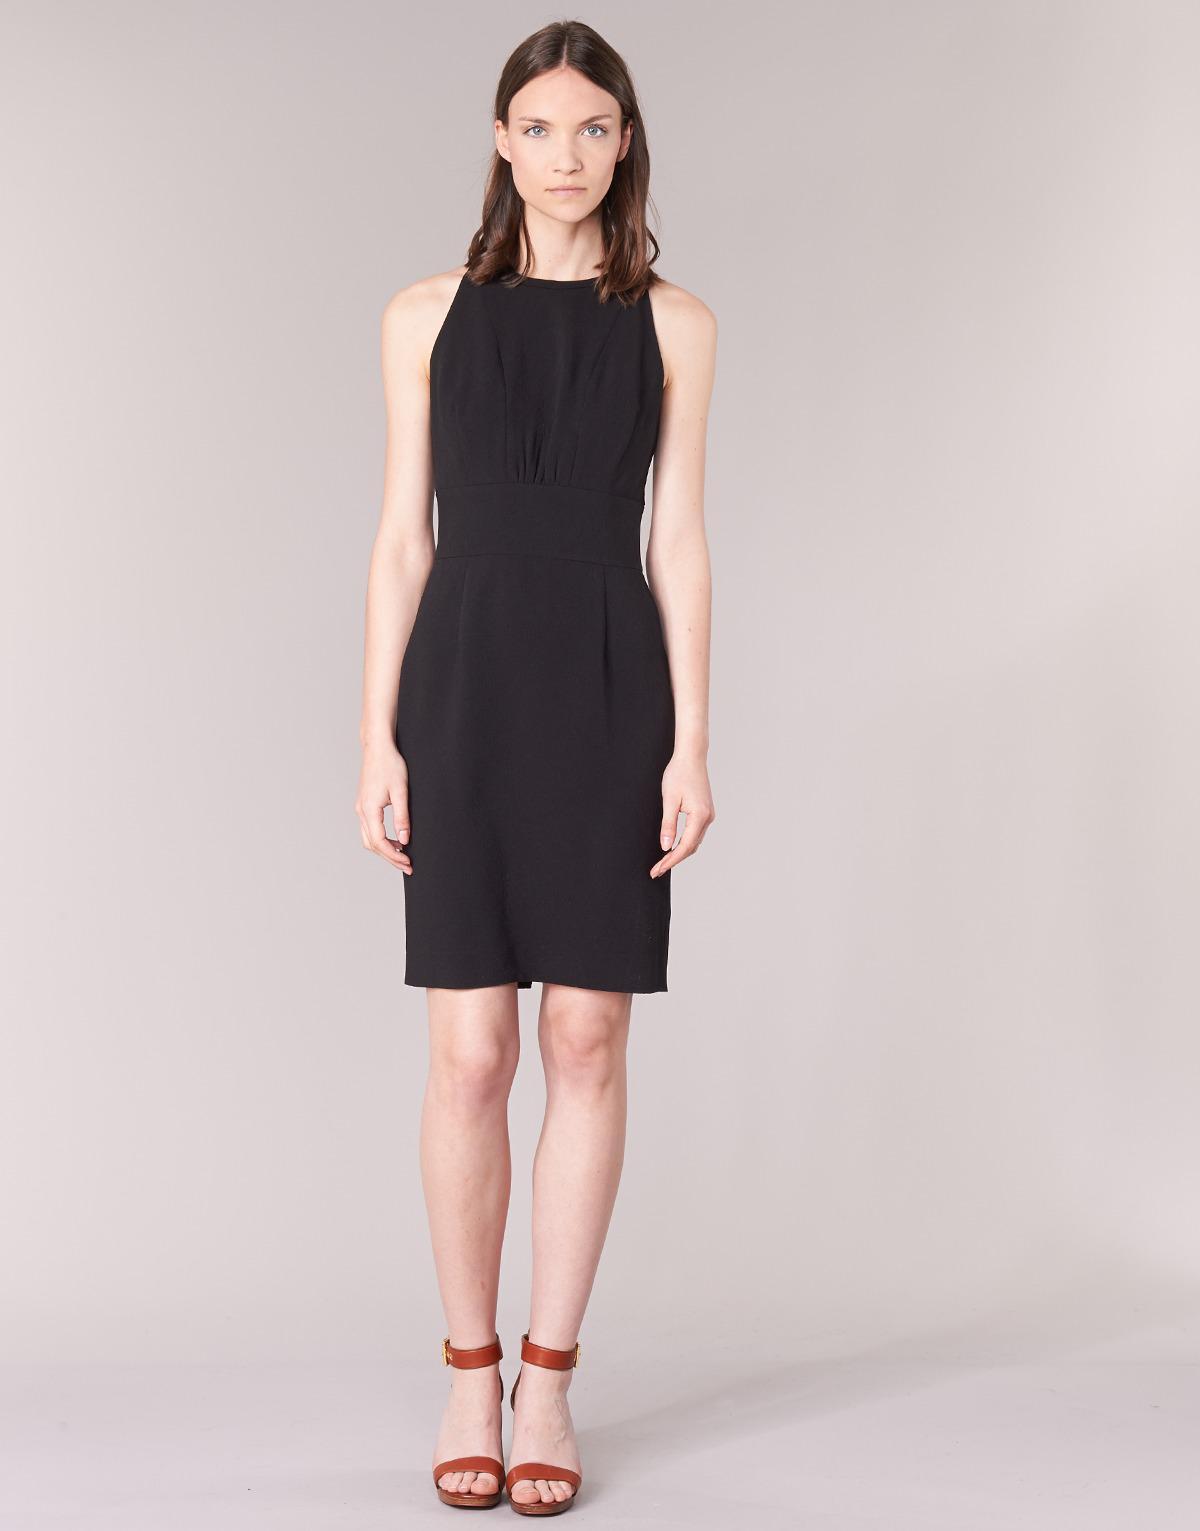 69f50a88a6 Armani Jeans Odialina Women s Dress In Black in Black - Lyst